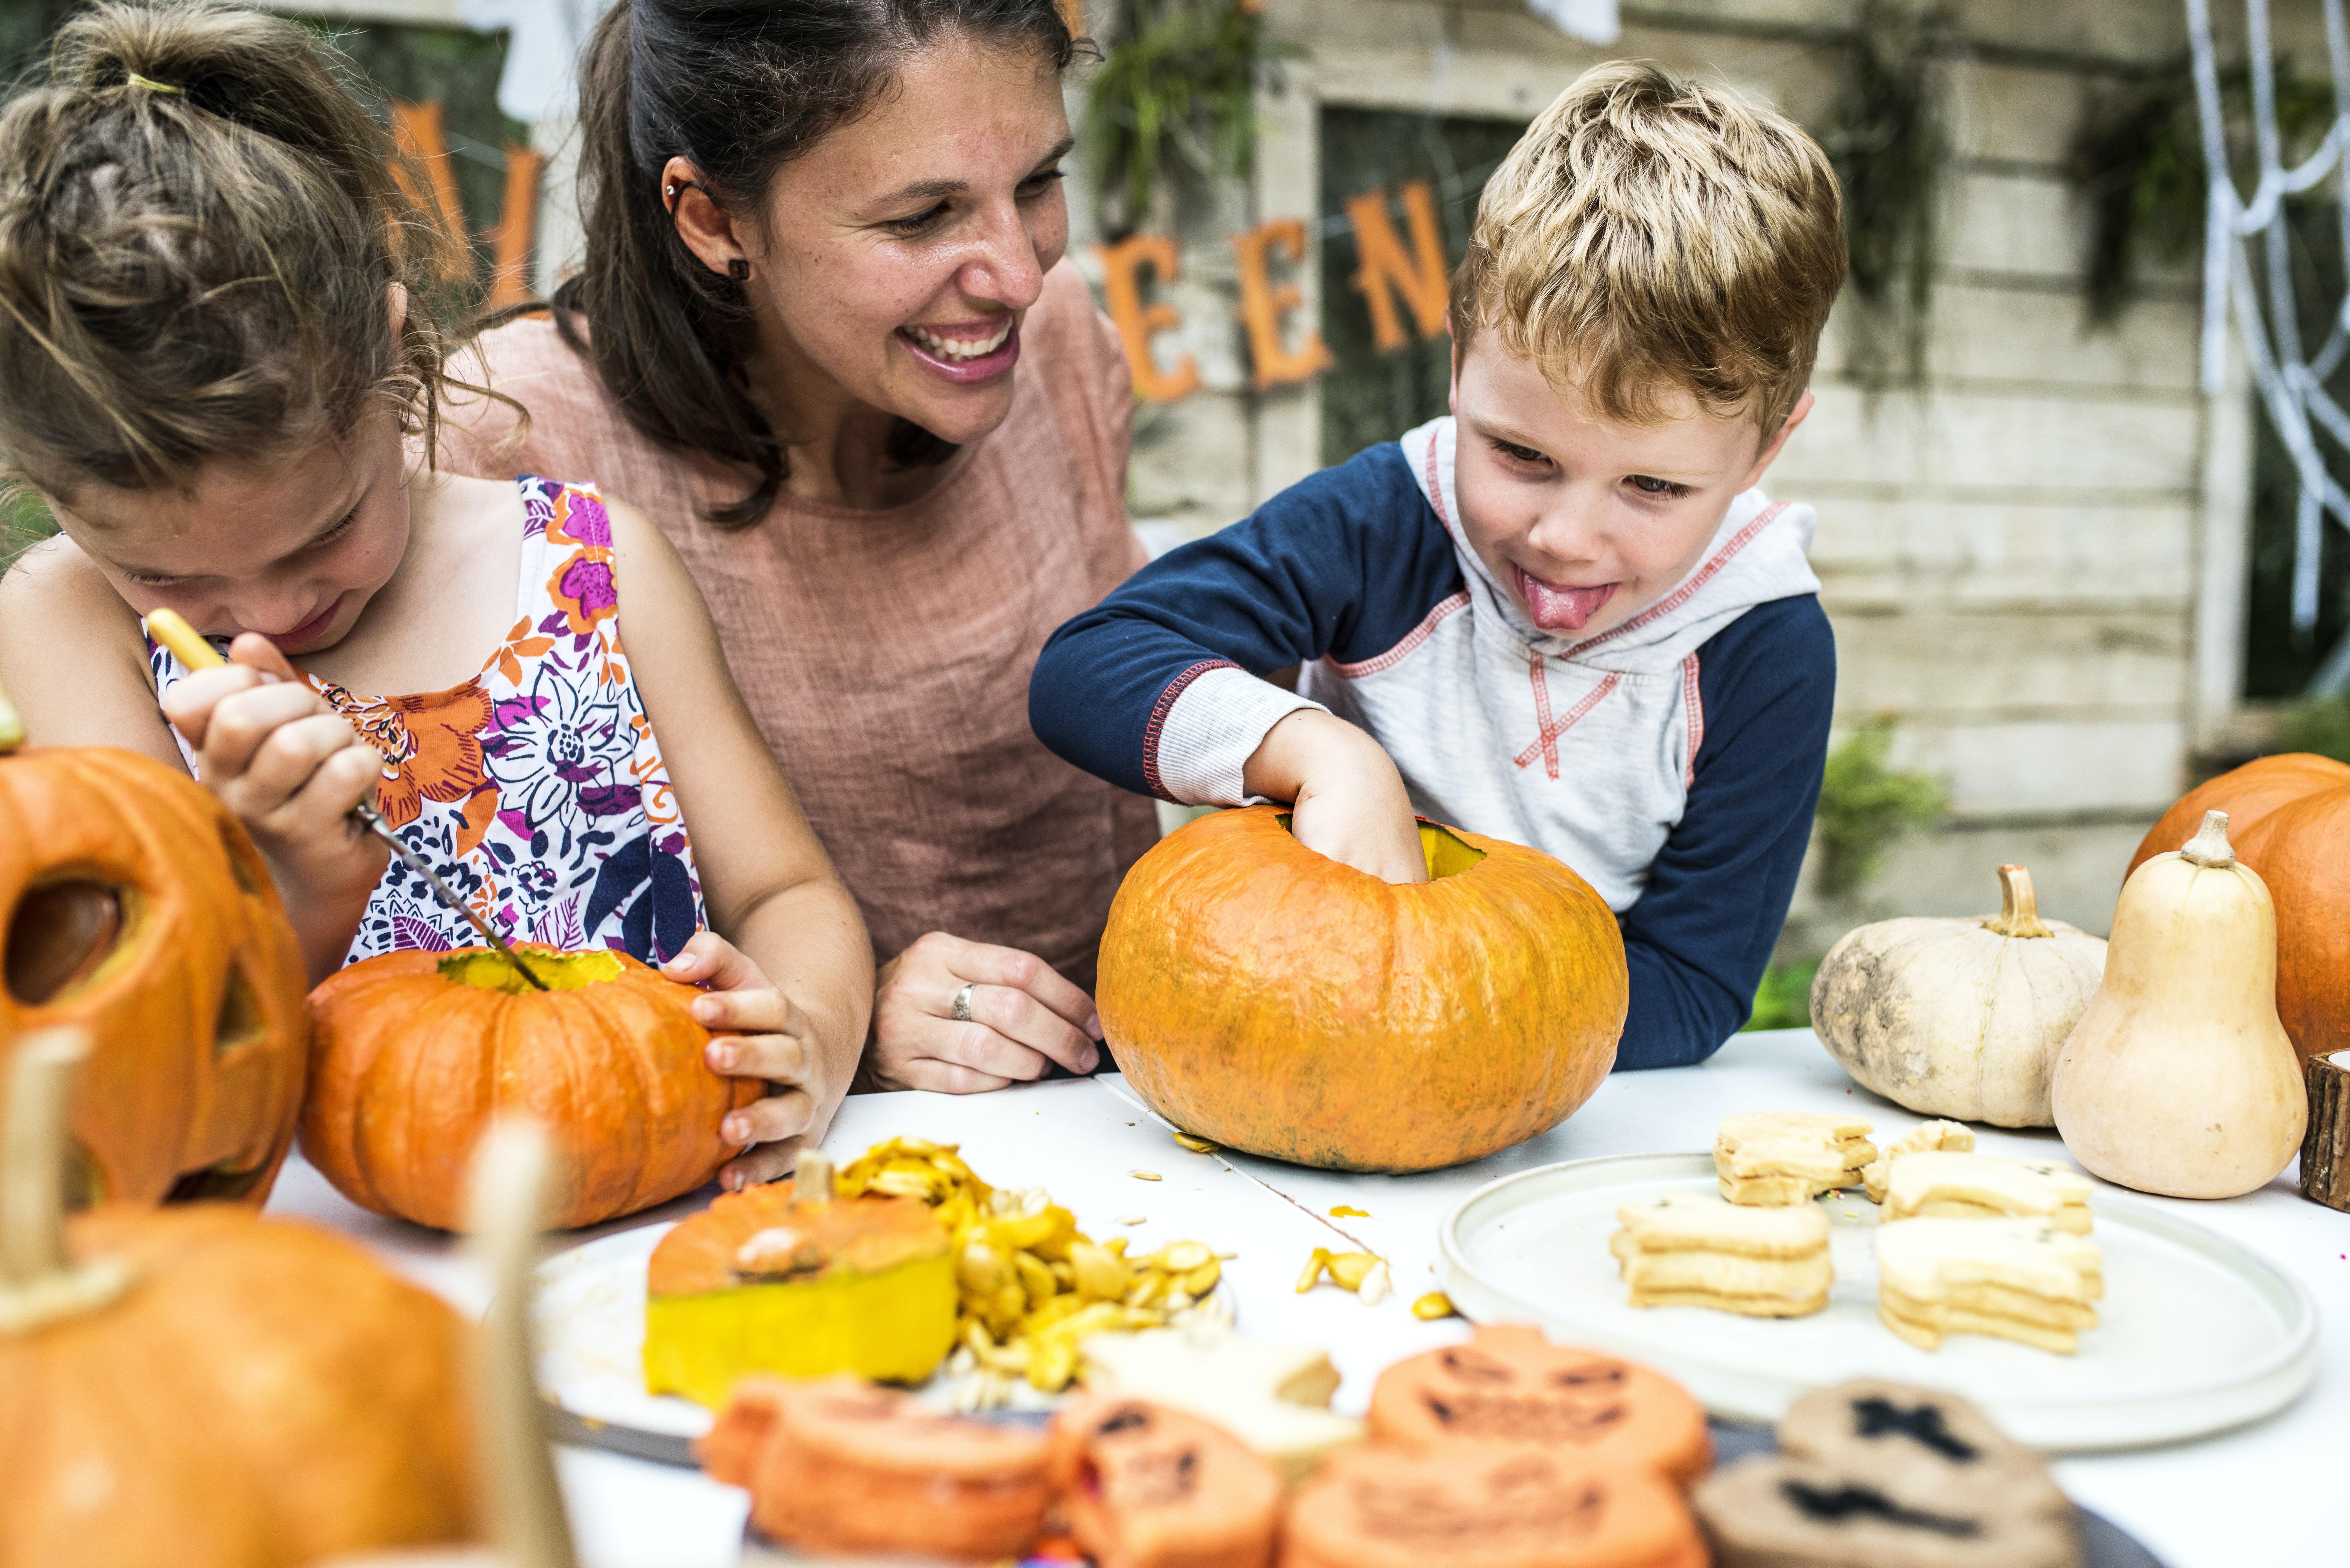 boy holding pumpkin on table top near woman